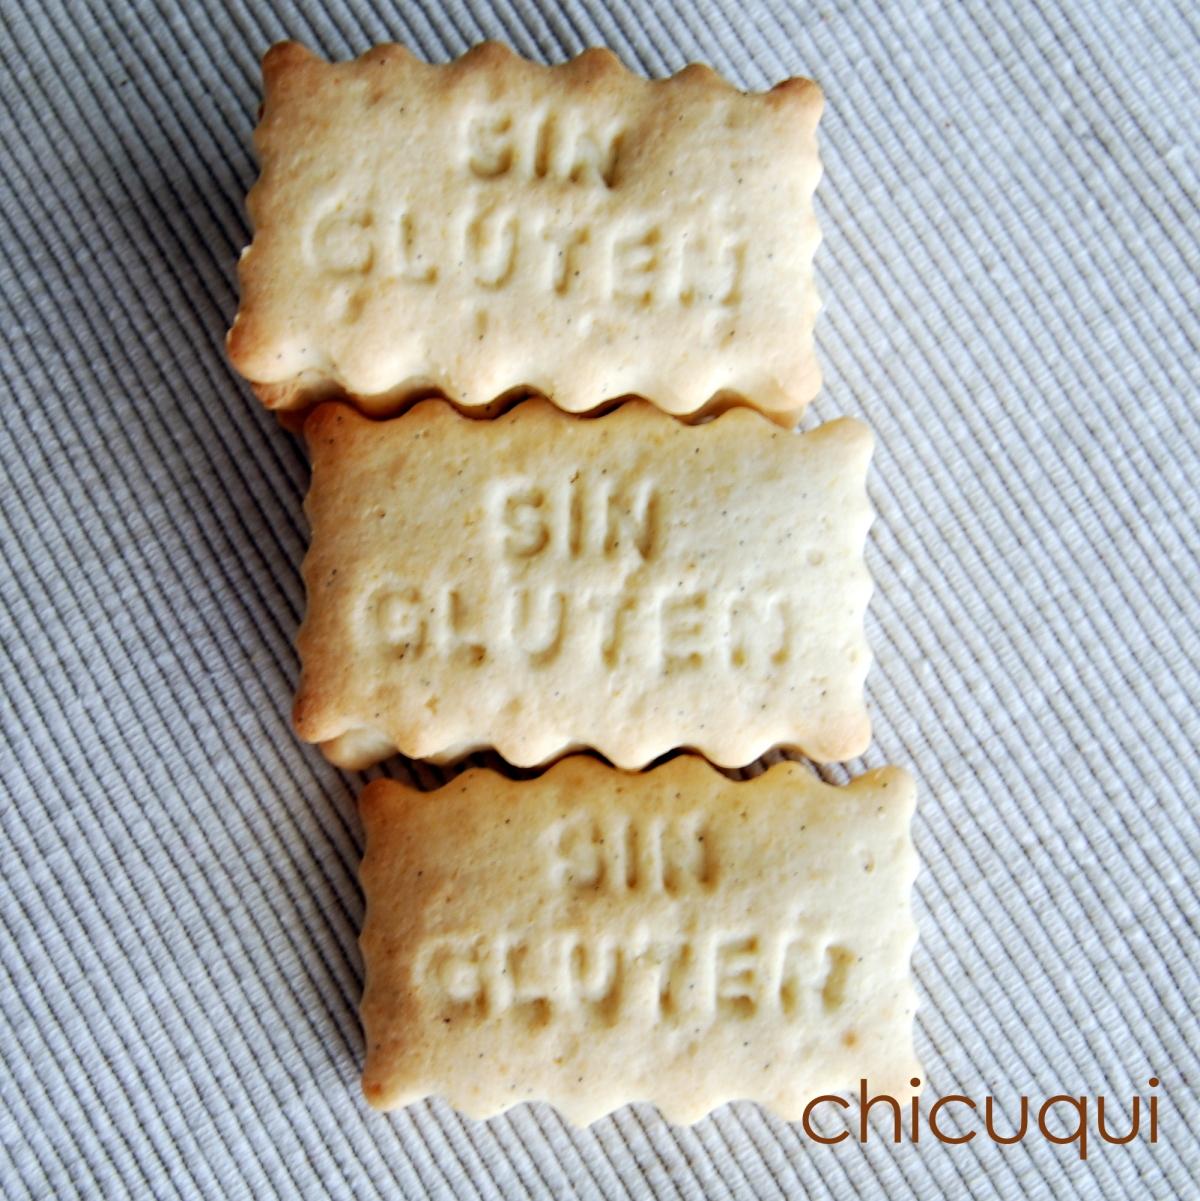 galletas sin gluten receta chicuqui galletas decoradas 04